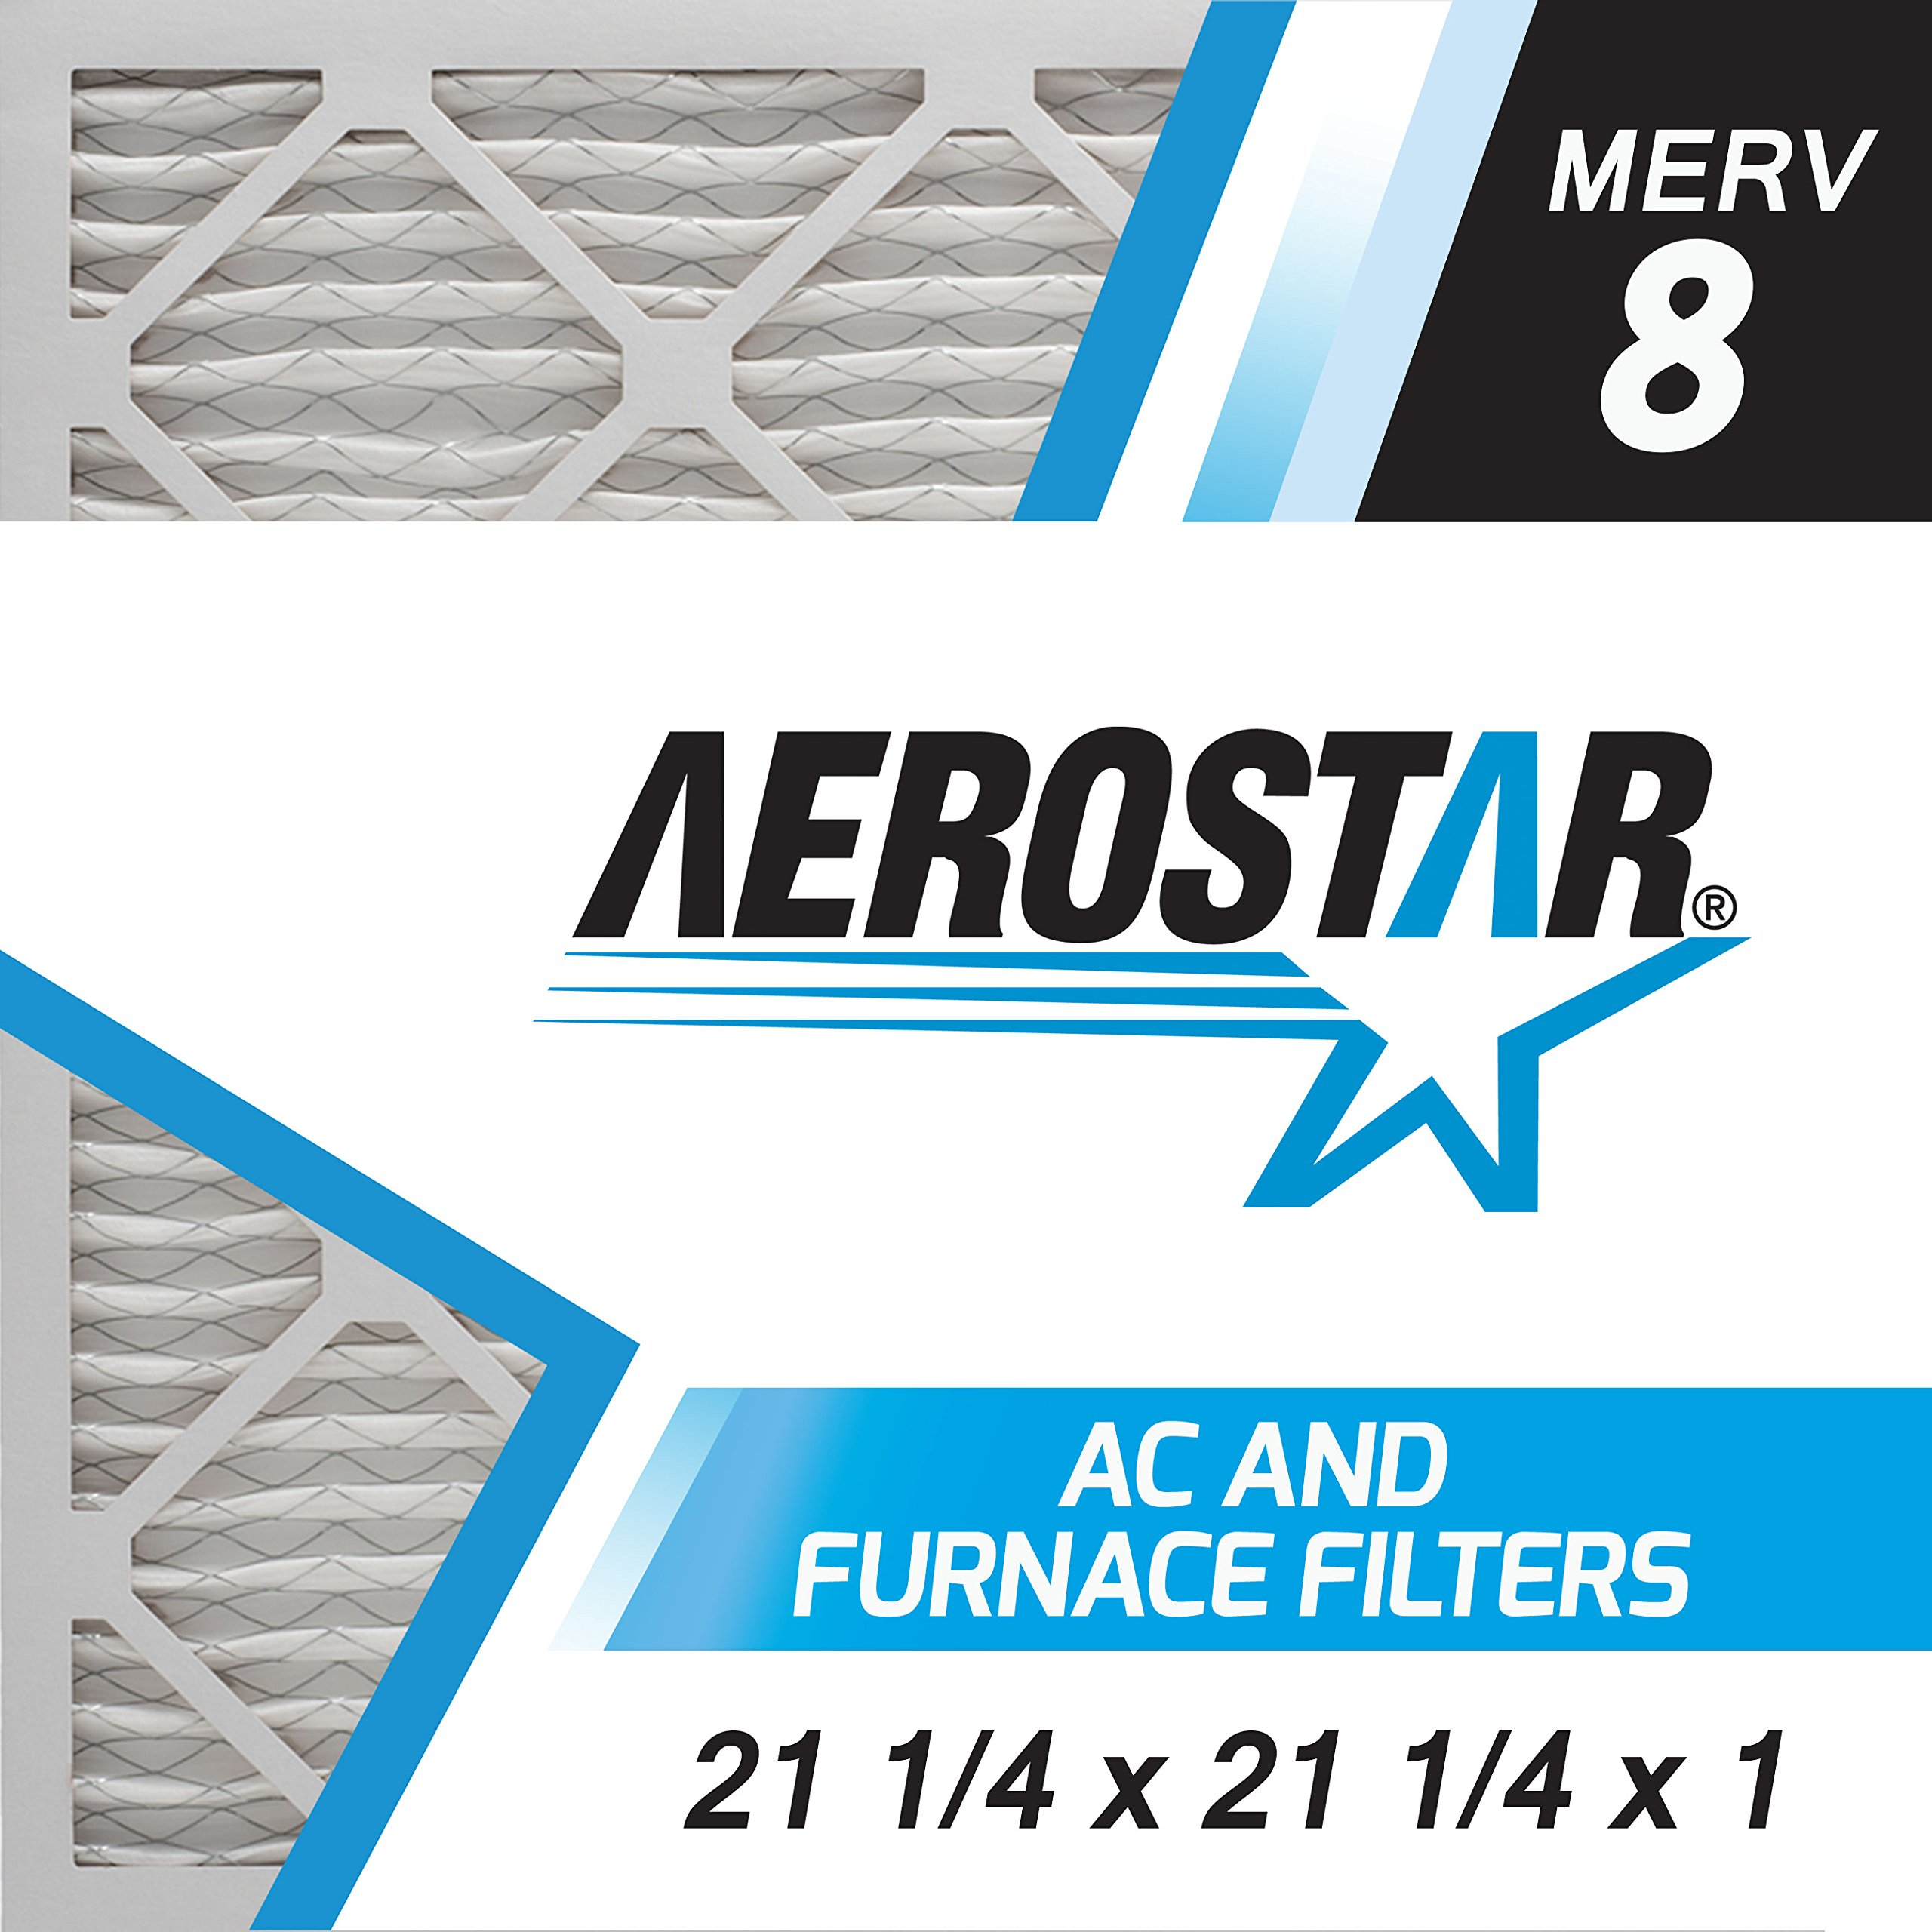 21 1/4 x 21 1/4 x 1 AC and Furnace Air Filter by Aerostar - MERV 8, Box of 12